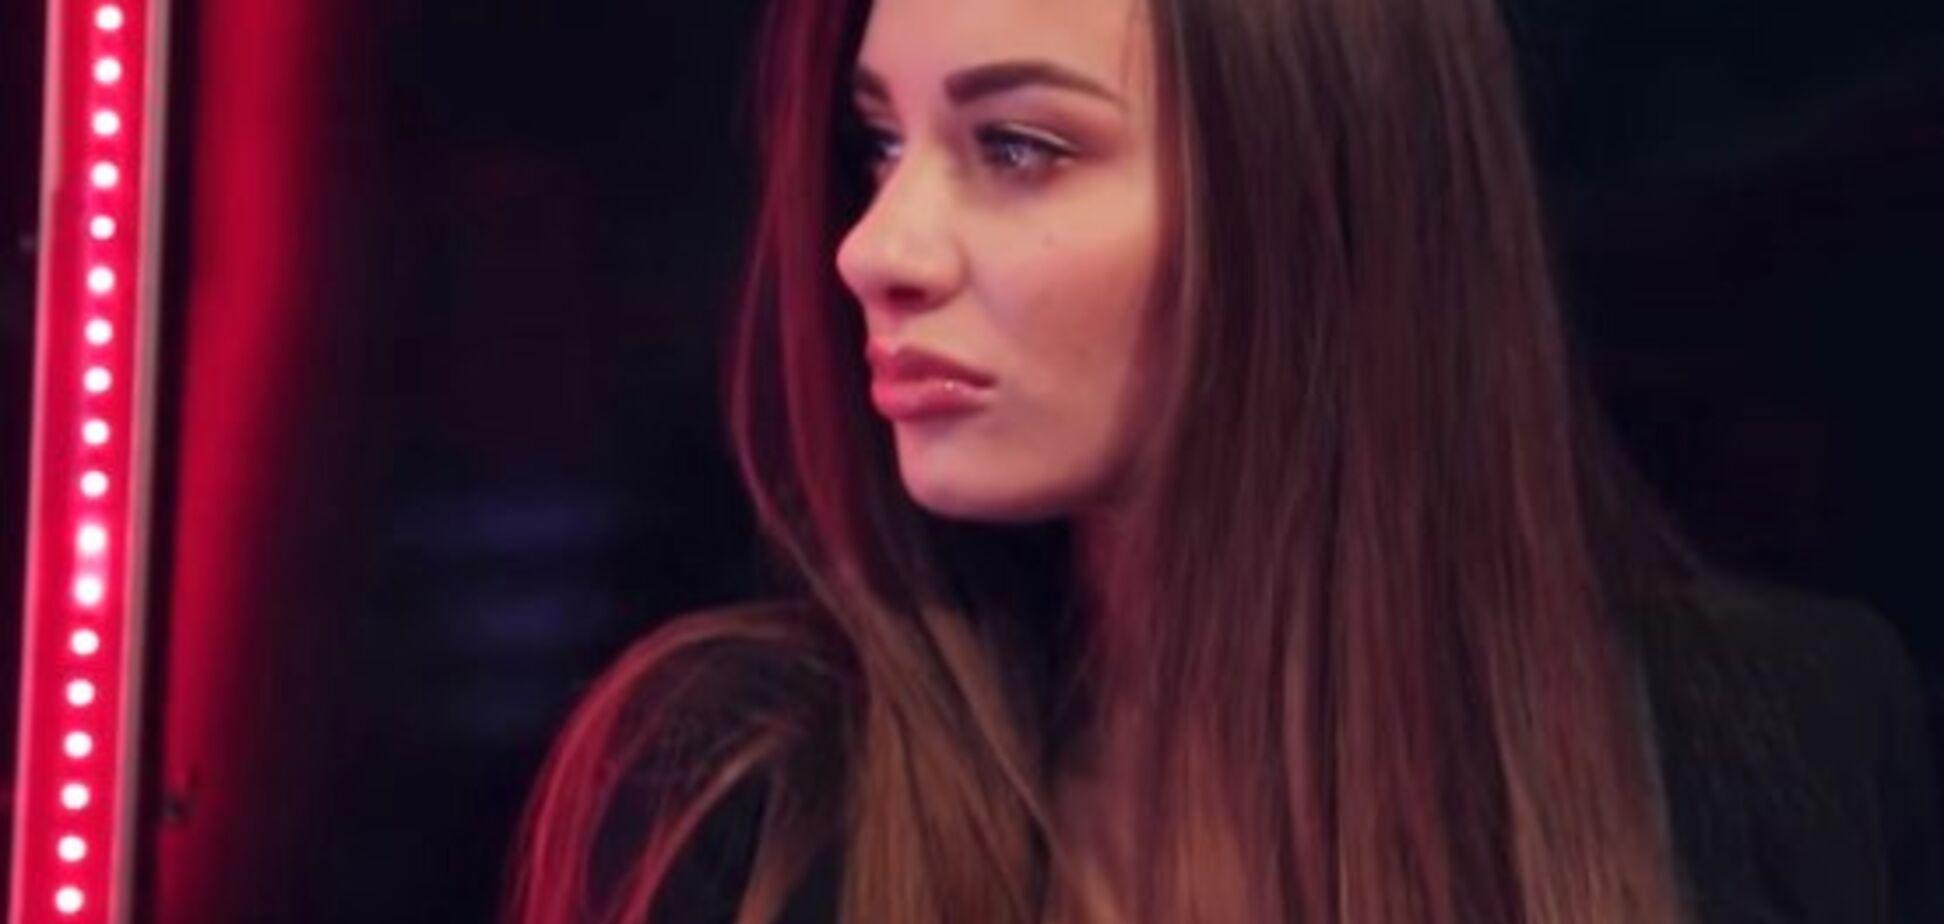 Влюбилась в Бориса Апреля: жюри 'Голоса' не пустили на шоу фанатку Зианджи